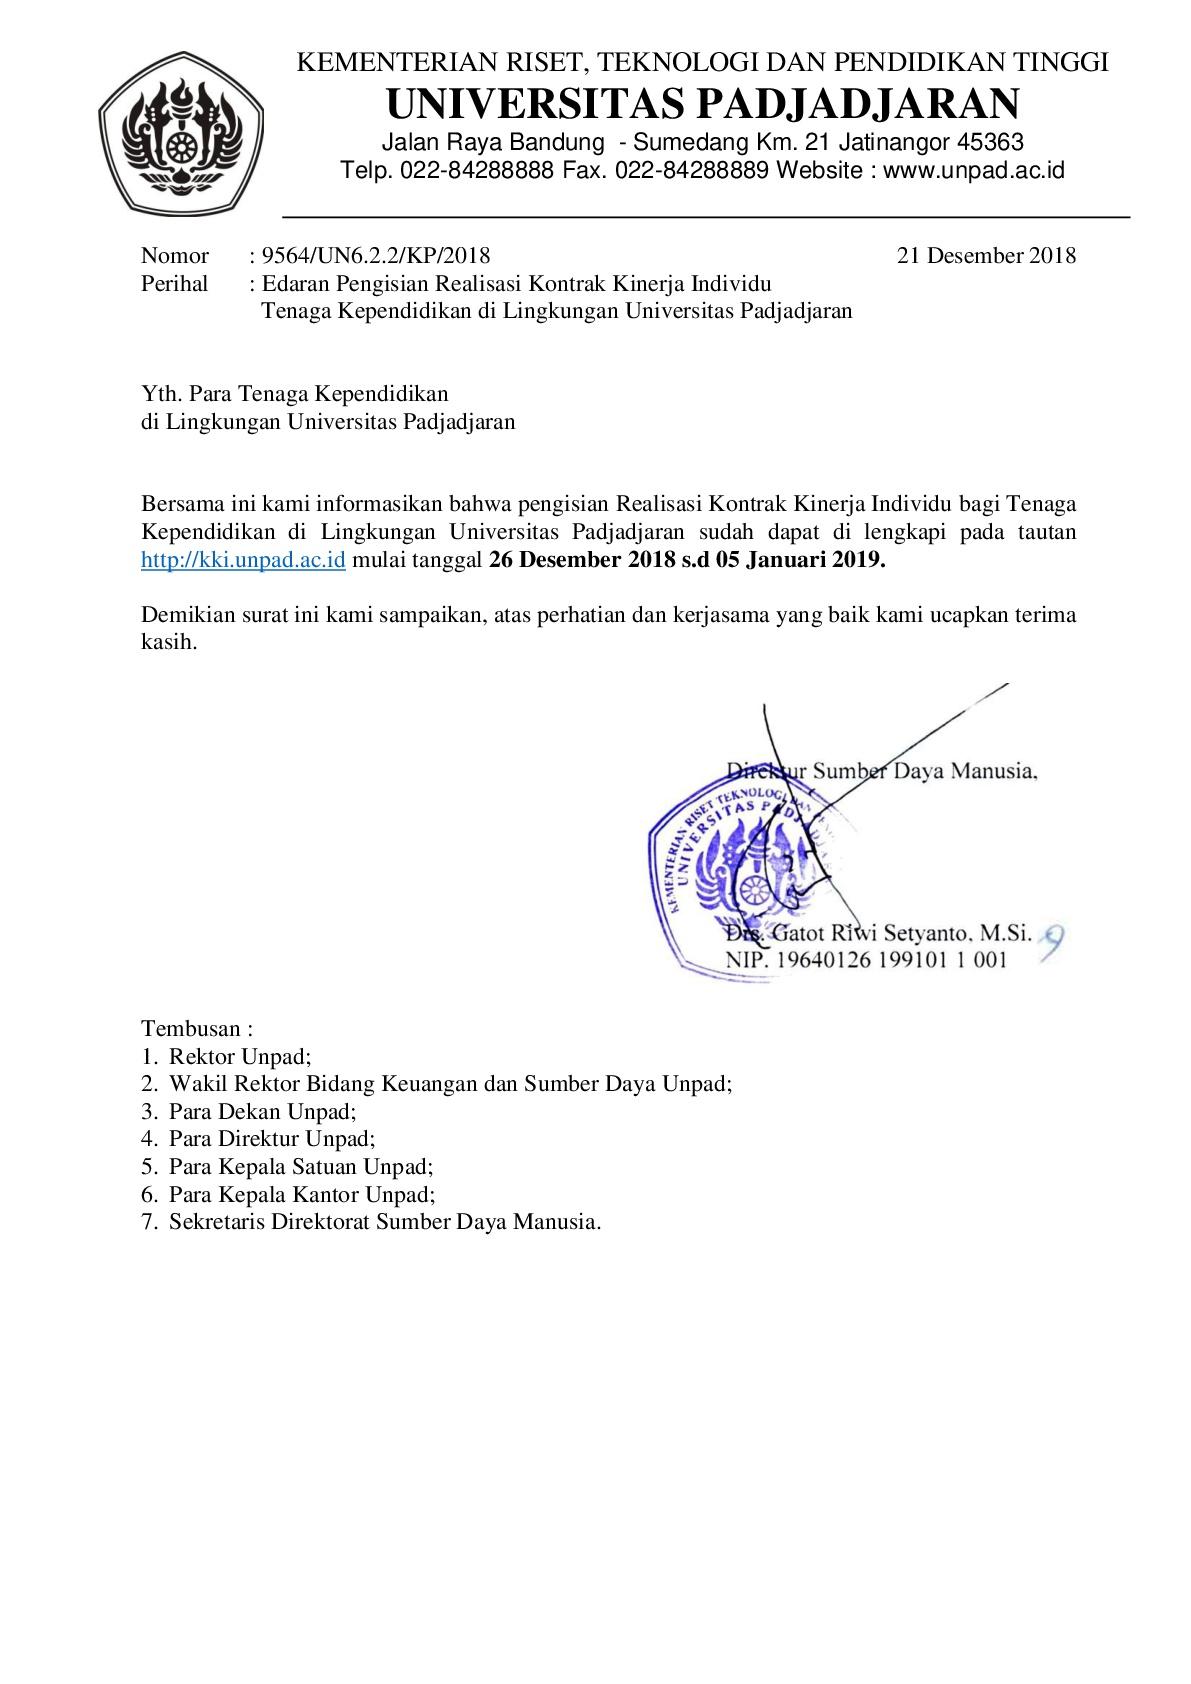 Edaran Pengisian Kontrak Kerja Individu Tenaga Kependidikan Di Lingkungan Unpad Universitas Padjadjaran